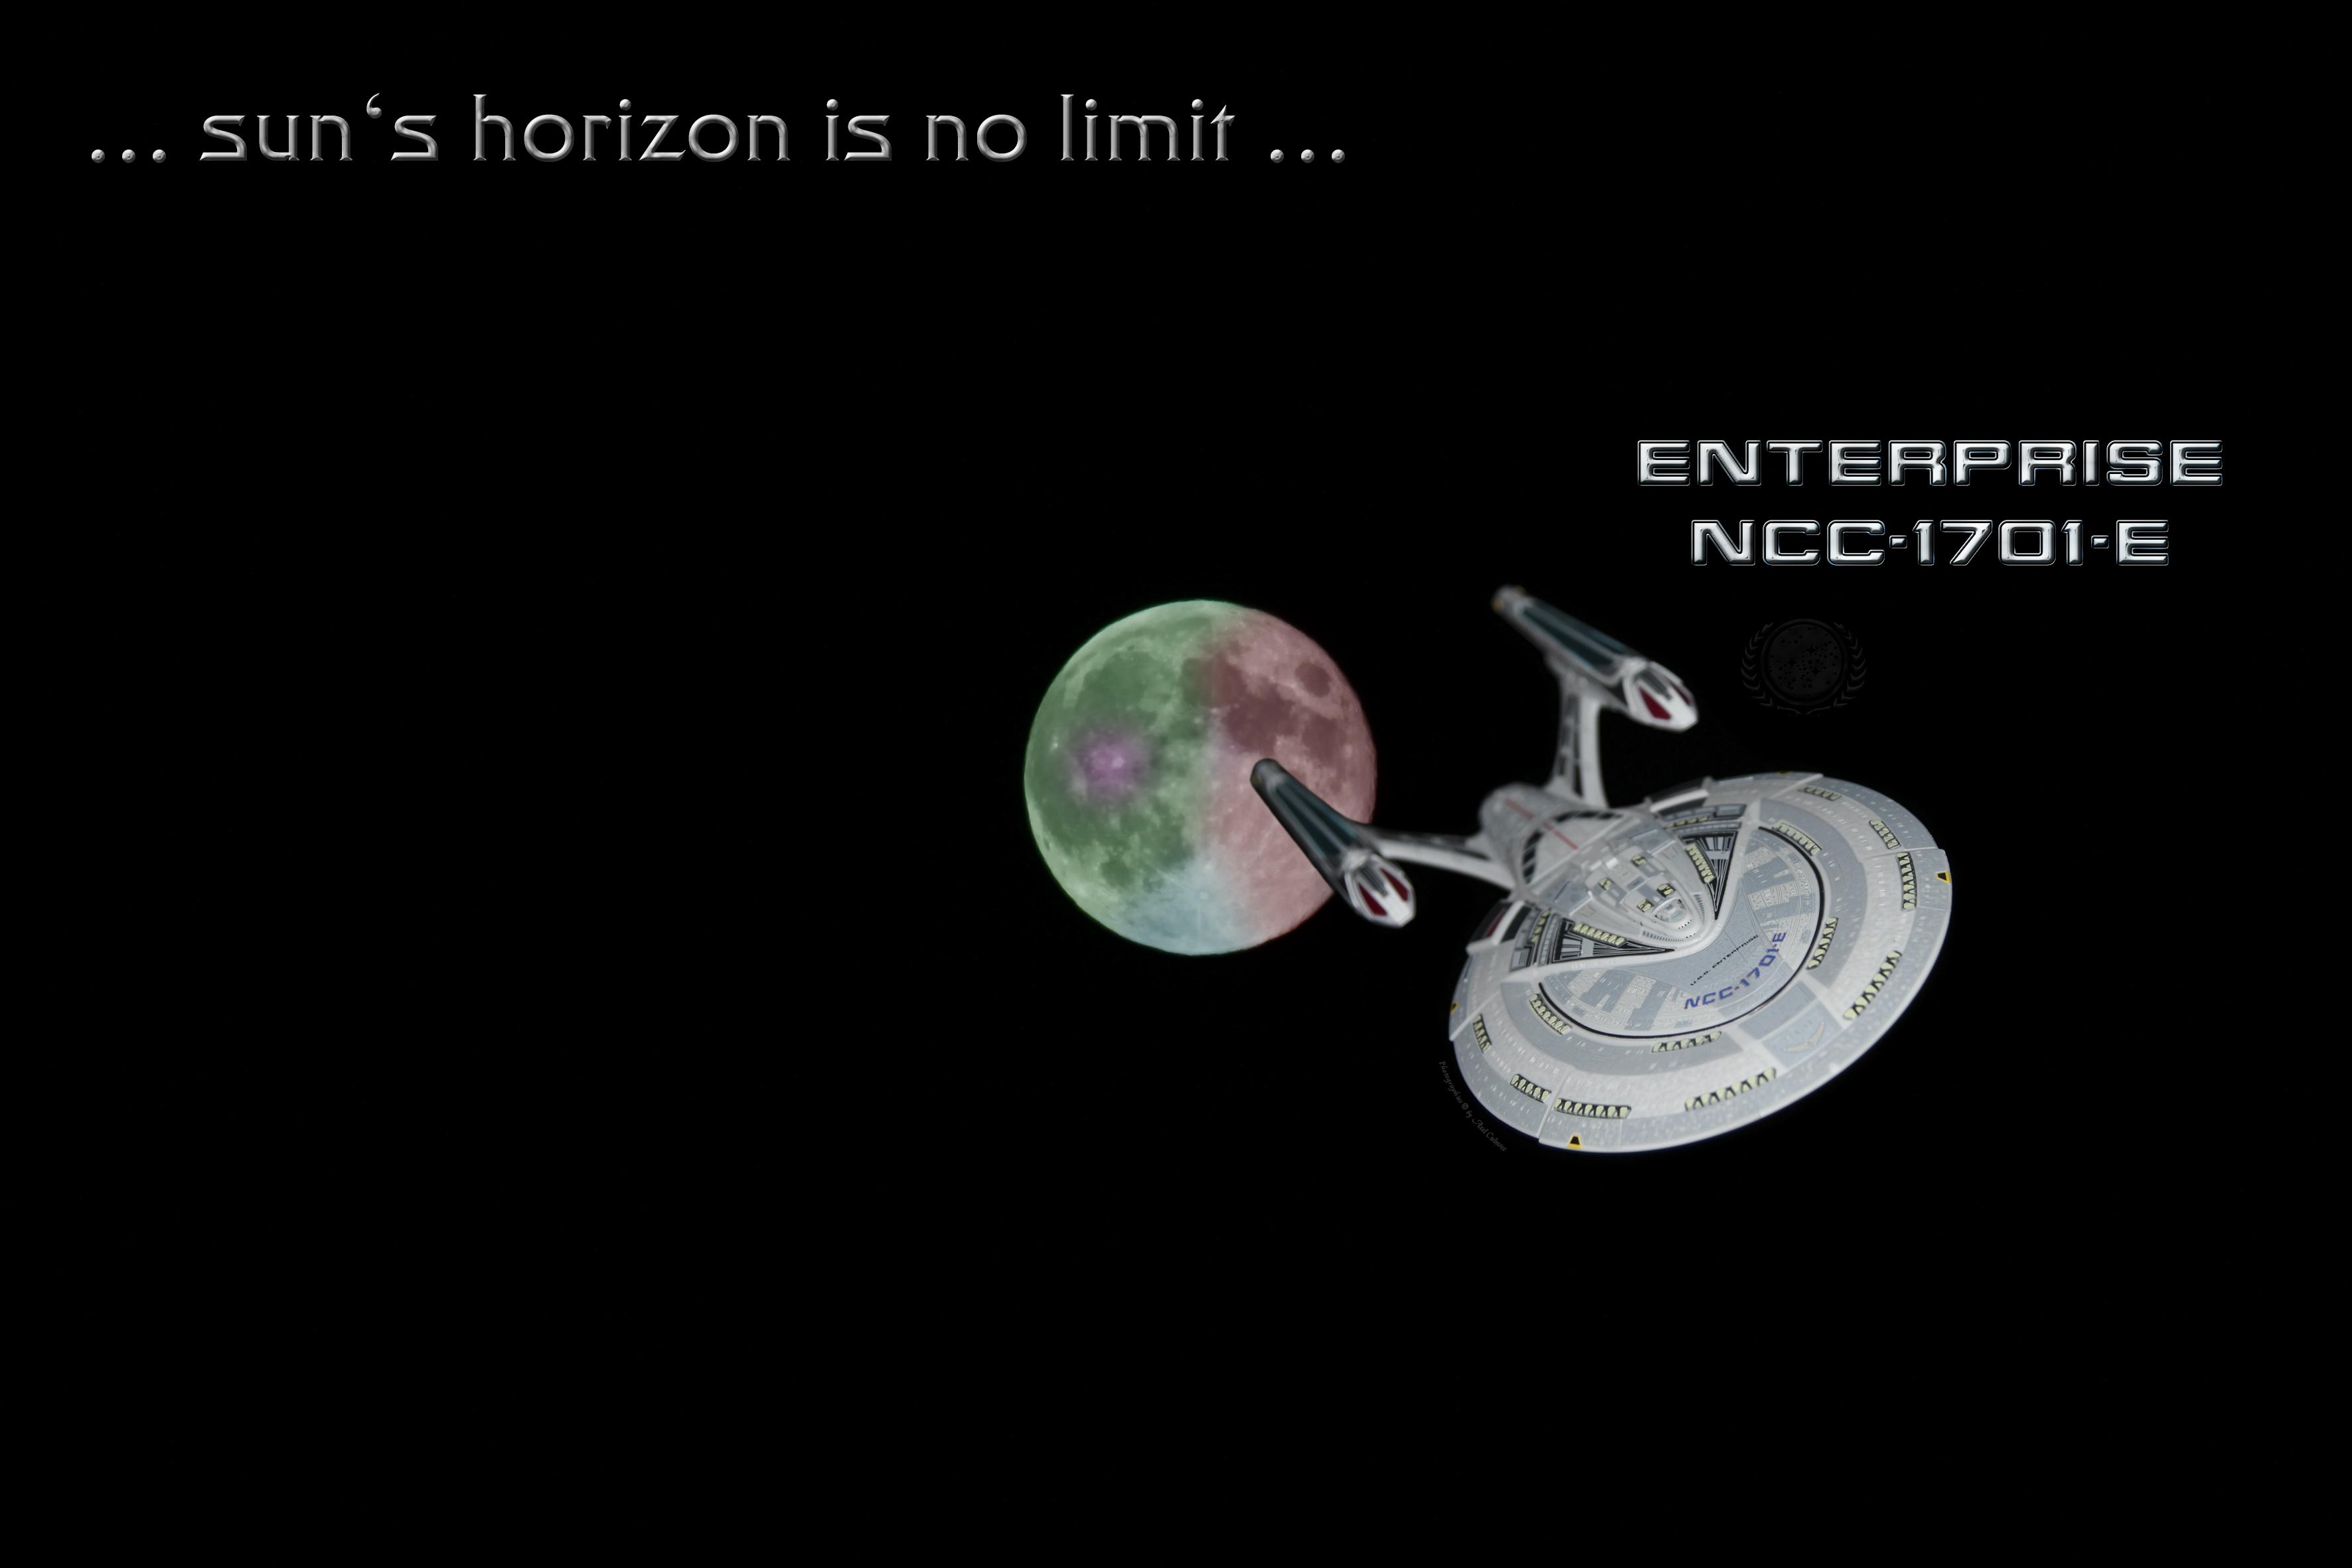 ENTERPRISE-E Horizon is no limit